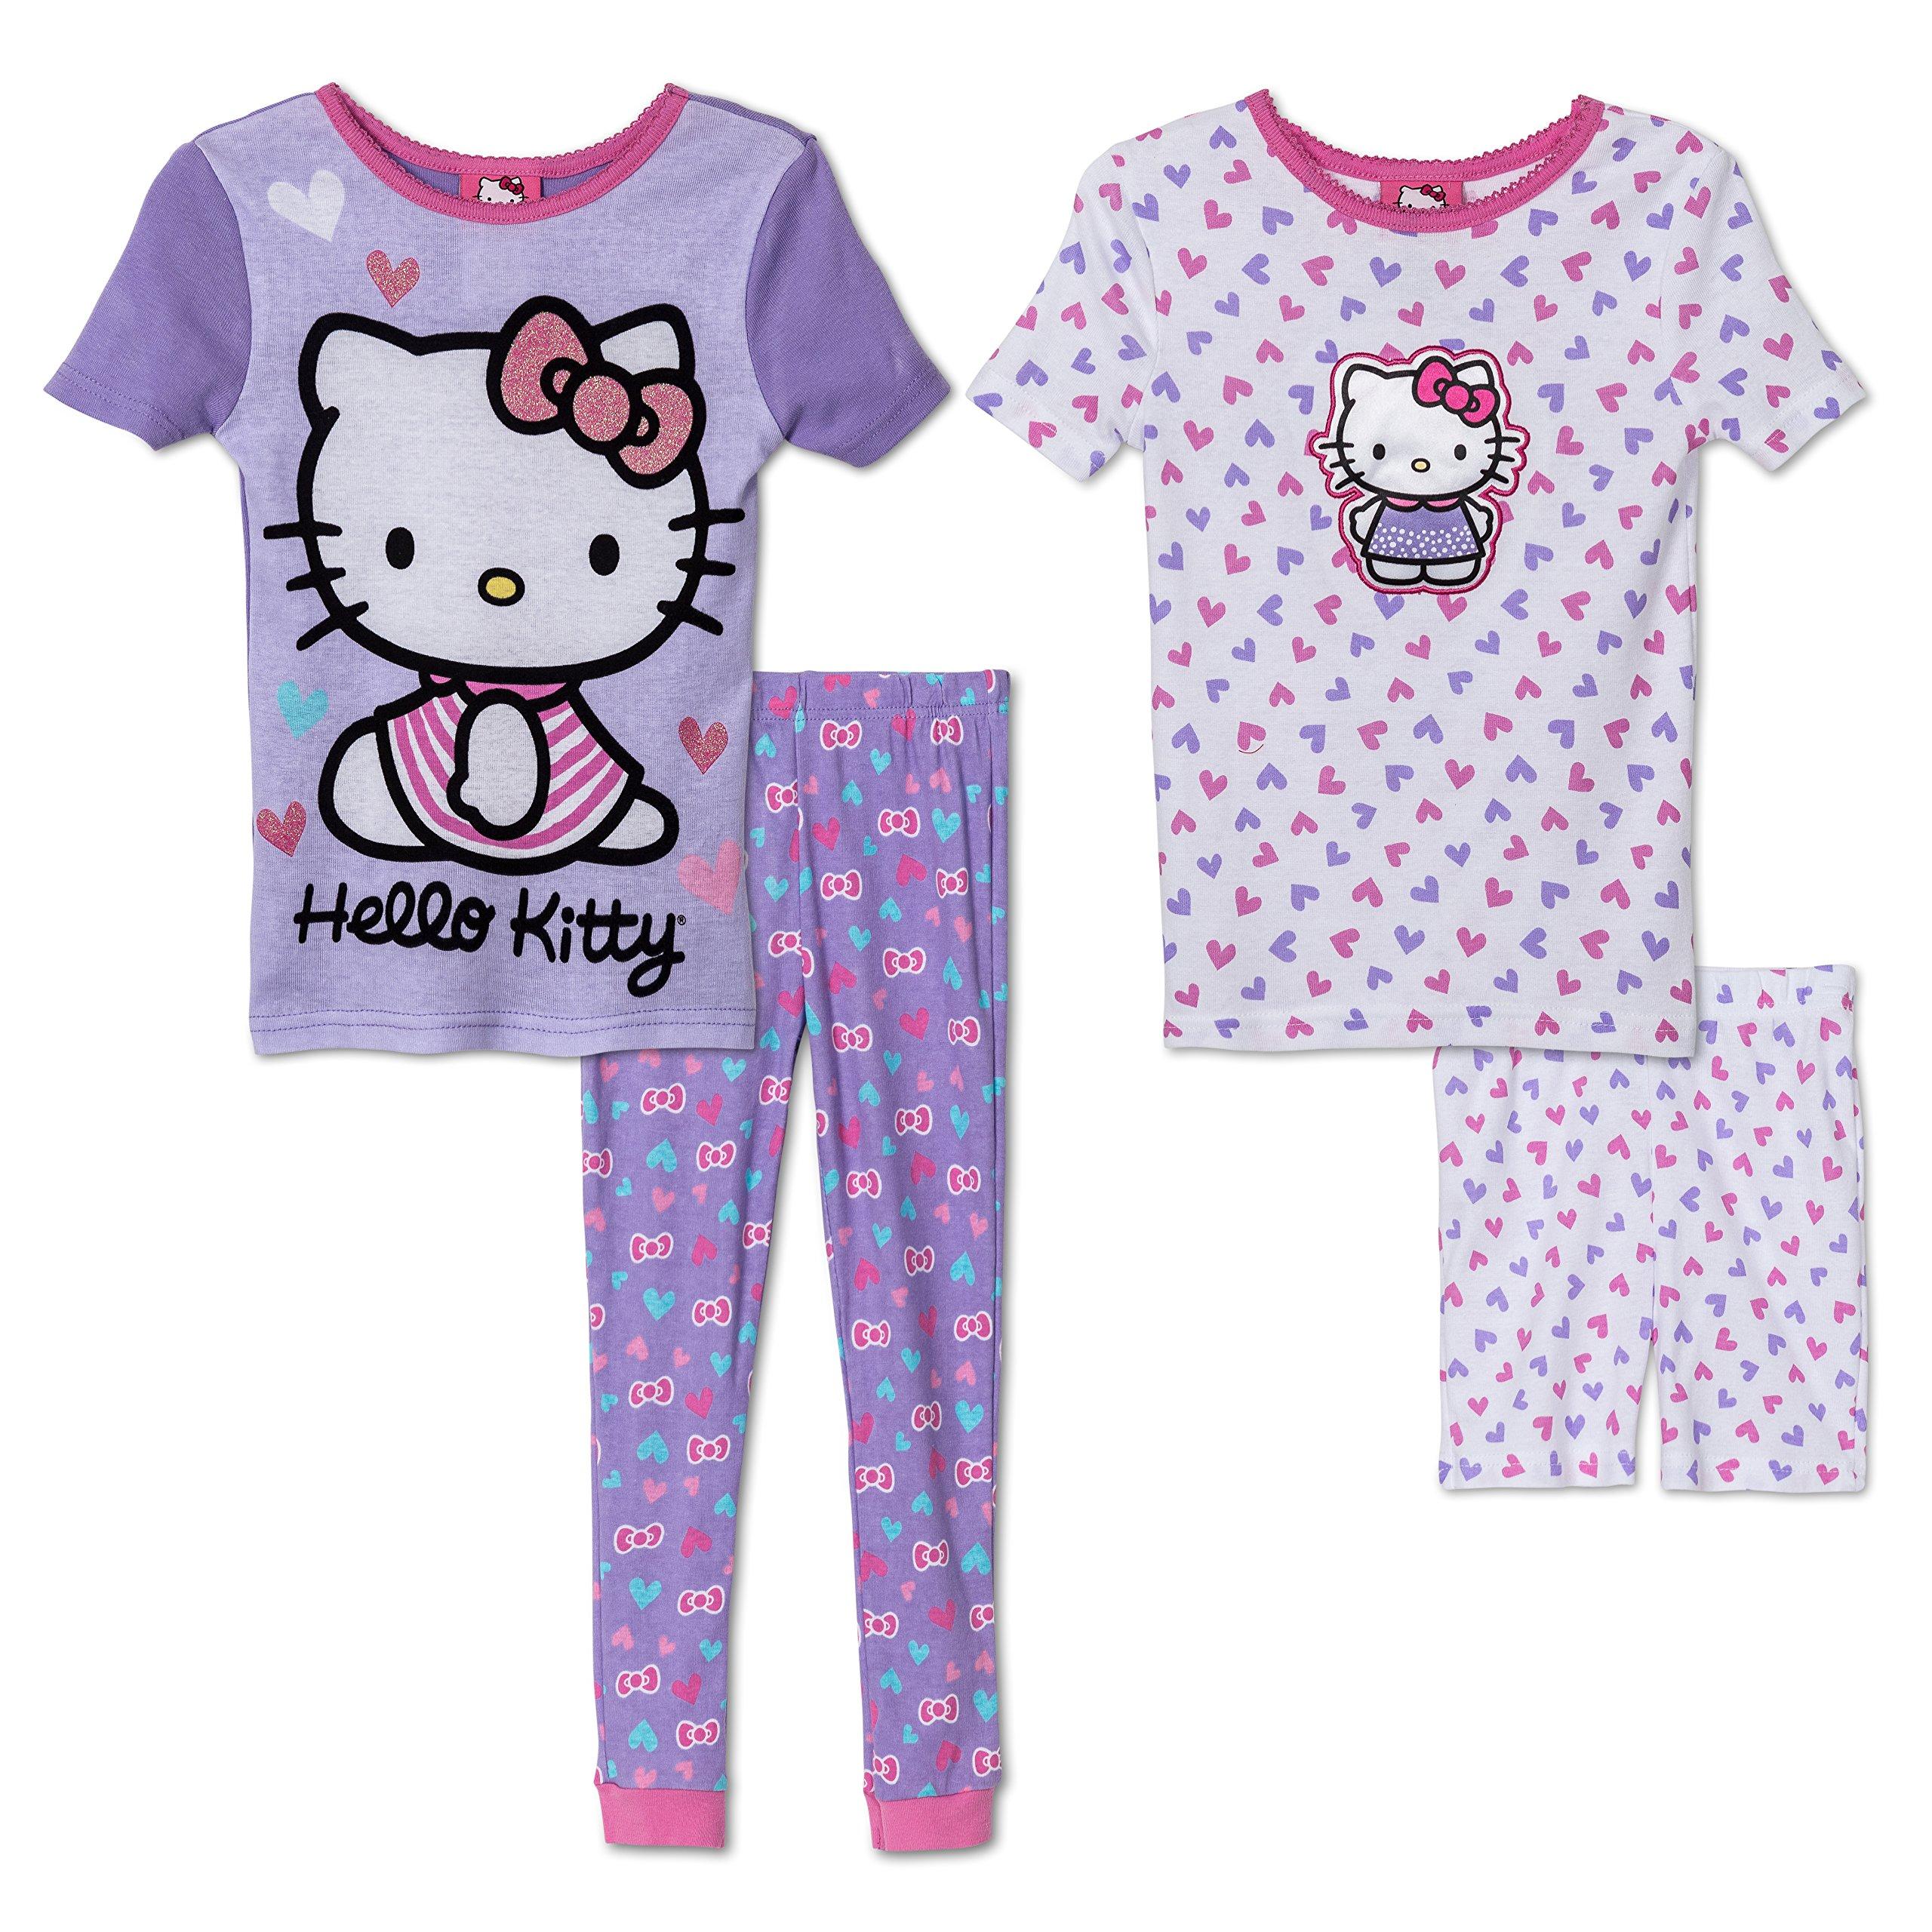 Komar Kids Girls 4 Piece Cotton Pajamas Sleepwear Set with Shorts and Pants (5, Hello Kitty Purple and Pink)